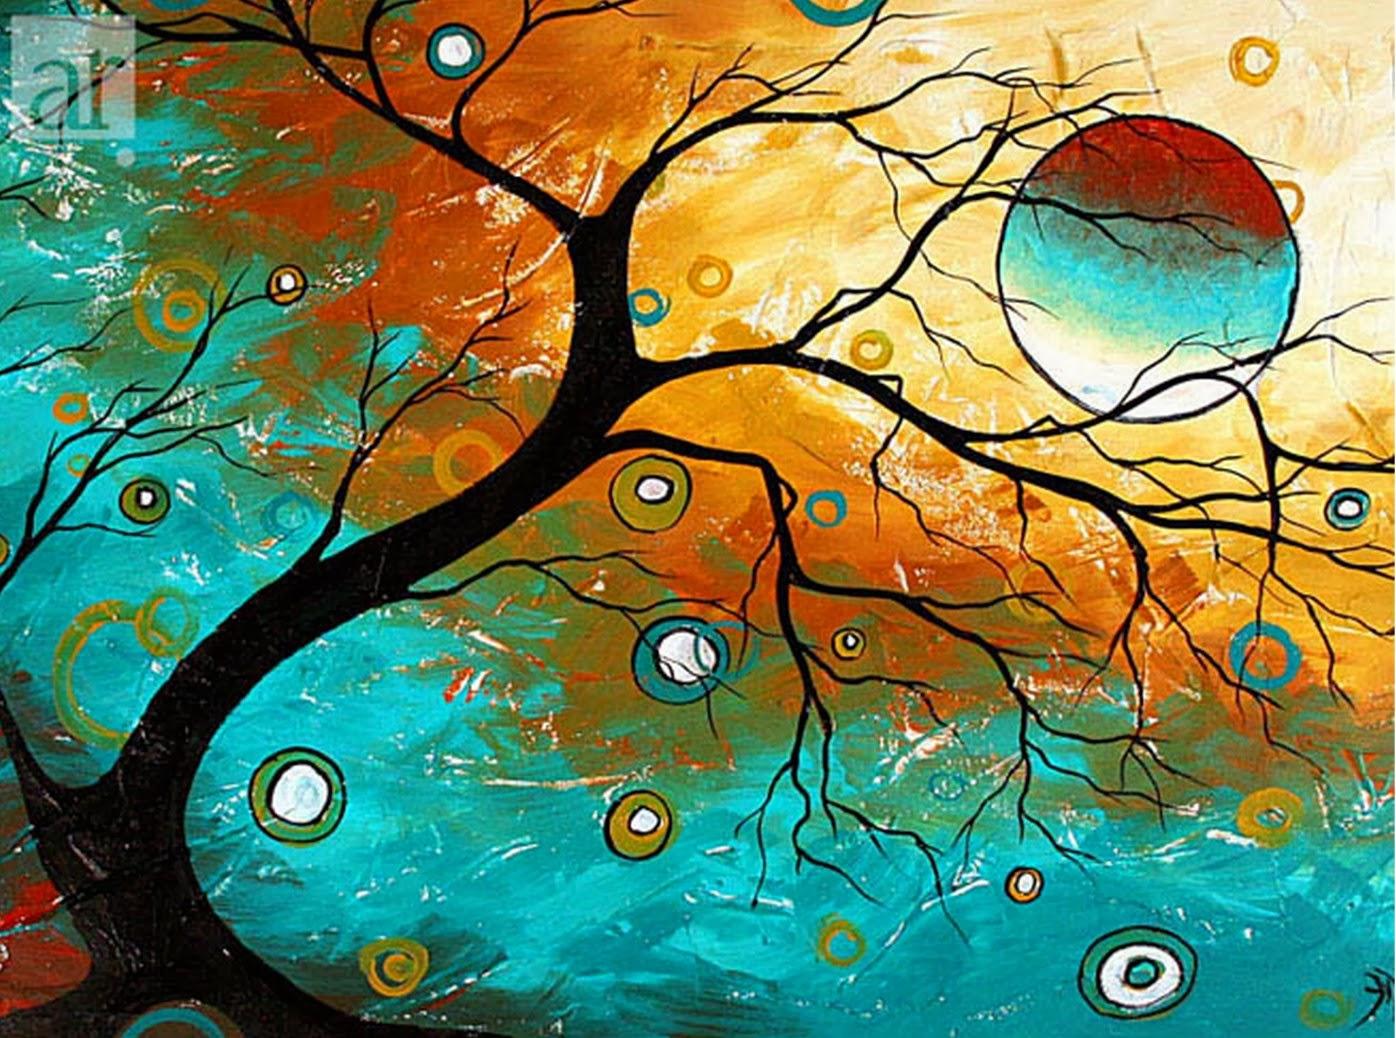 Cuadros modernos pinturas y dibujos cuadros modernos abstractos de paisajes aroon duncanson - Ideas para pintar cuadros ...